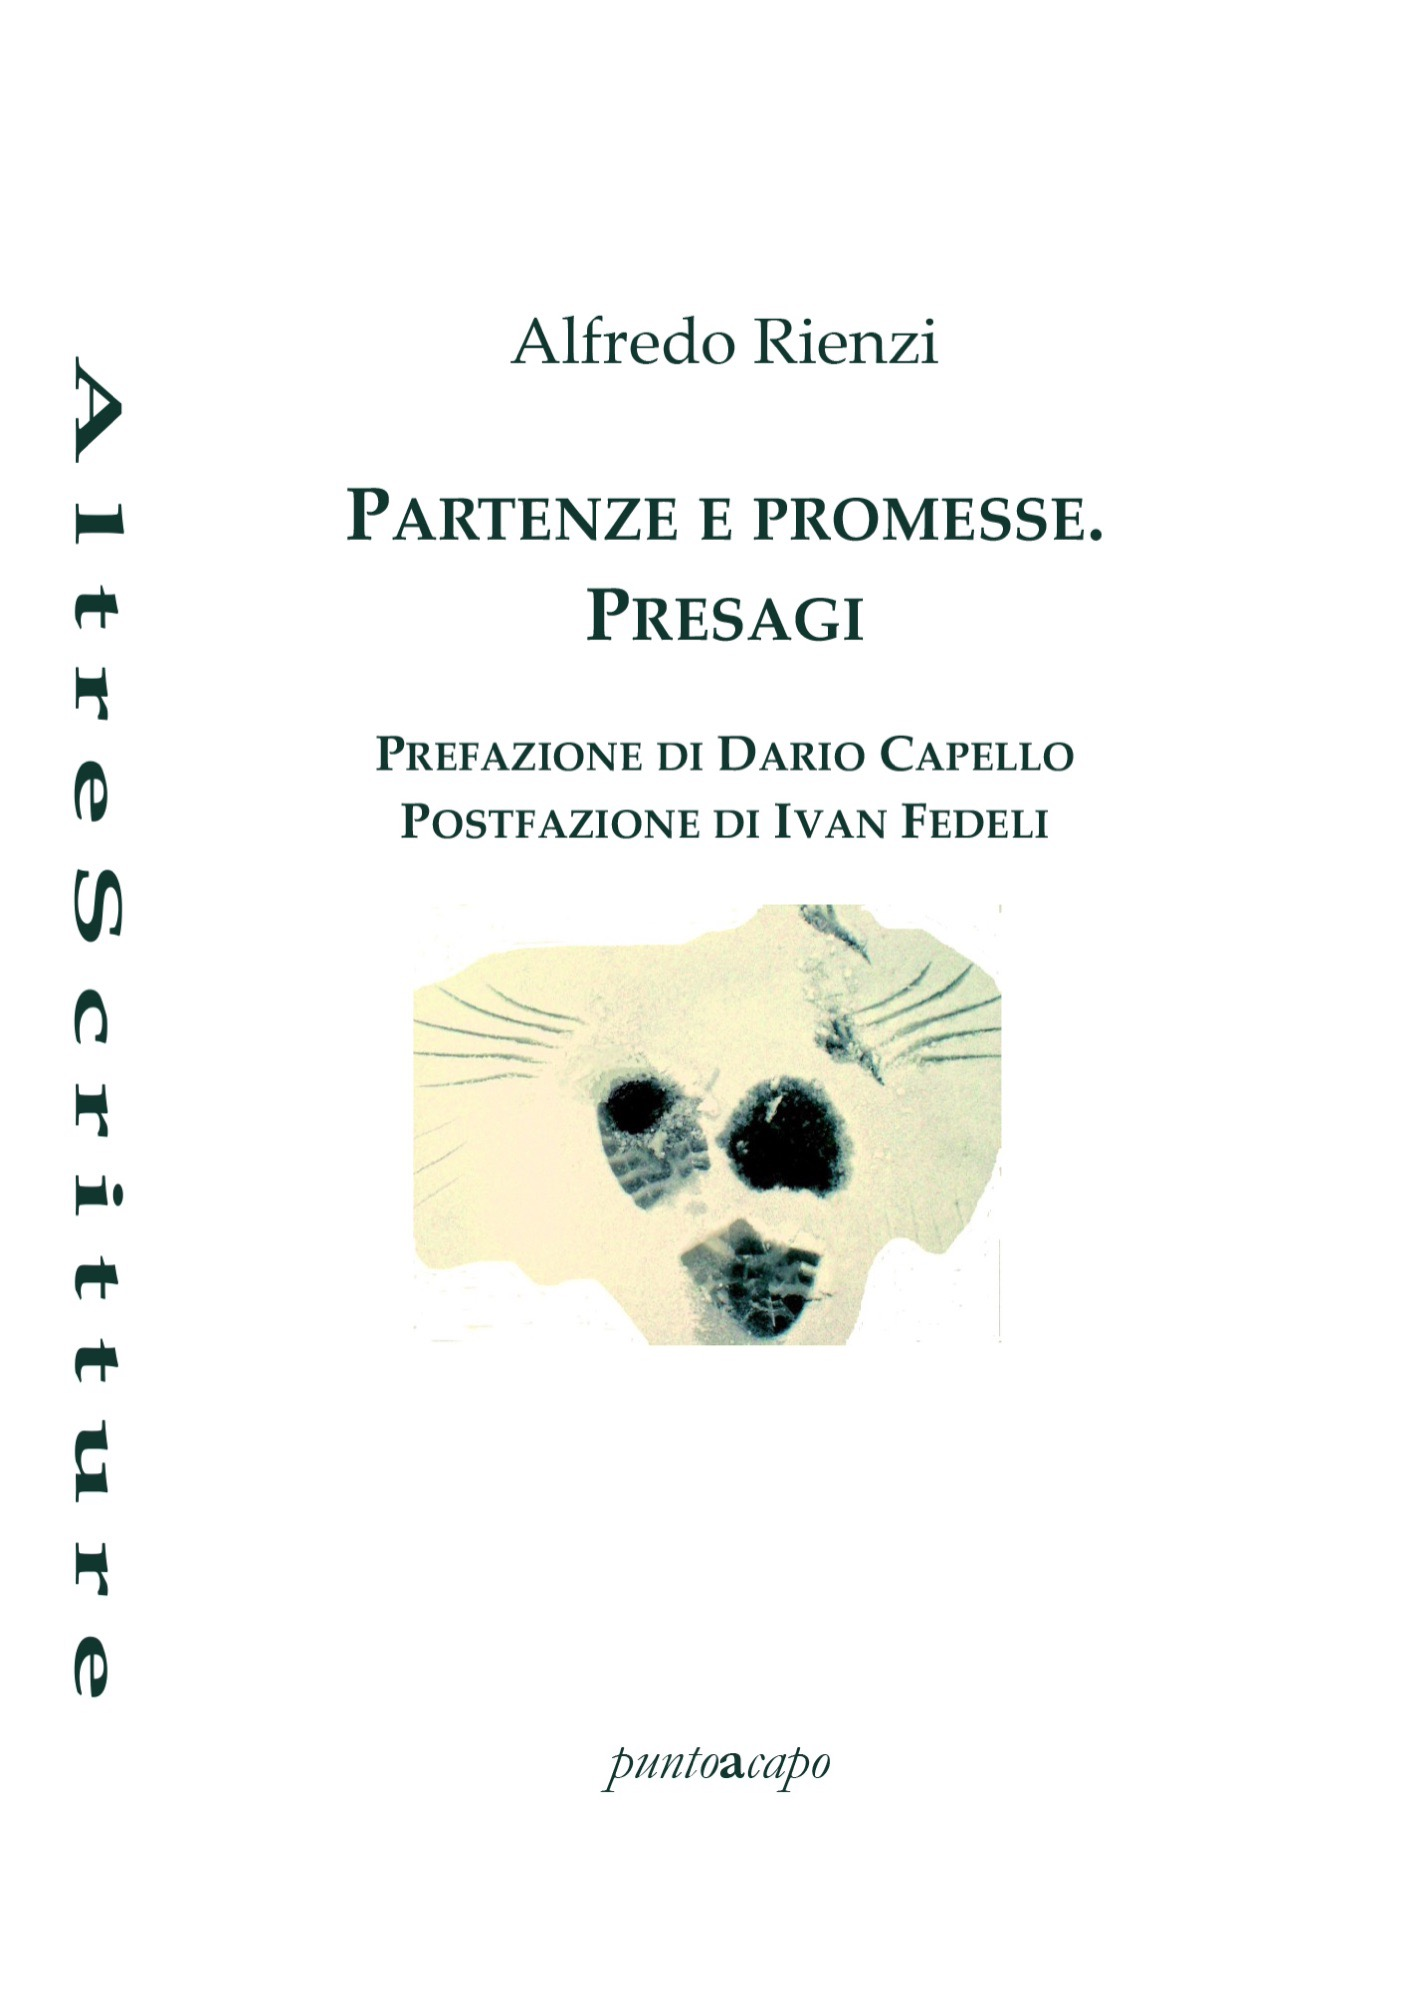 alfredorienzipartenzeepromesse-1599245773.jpg